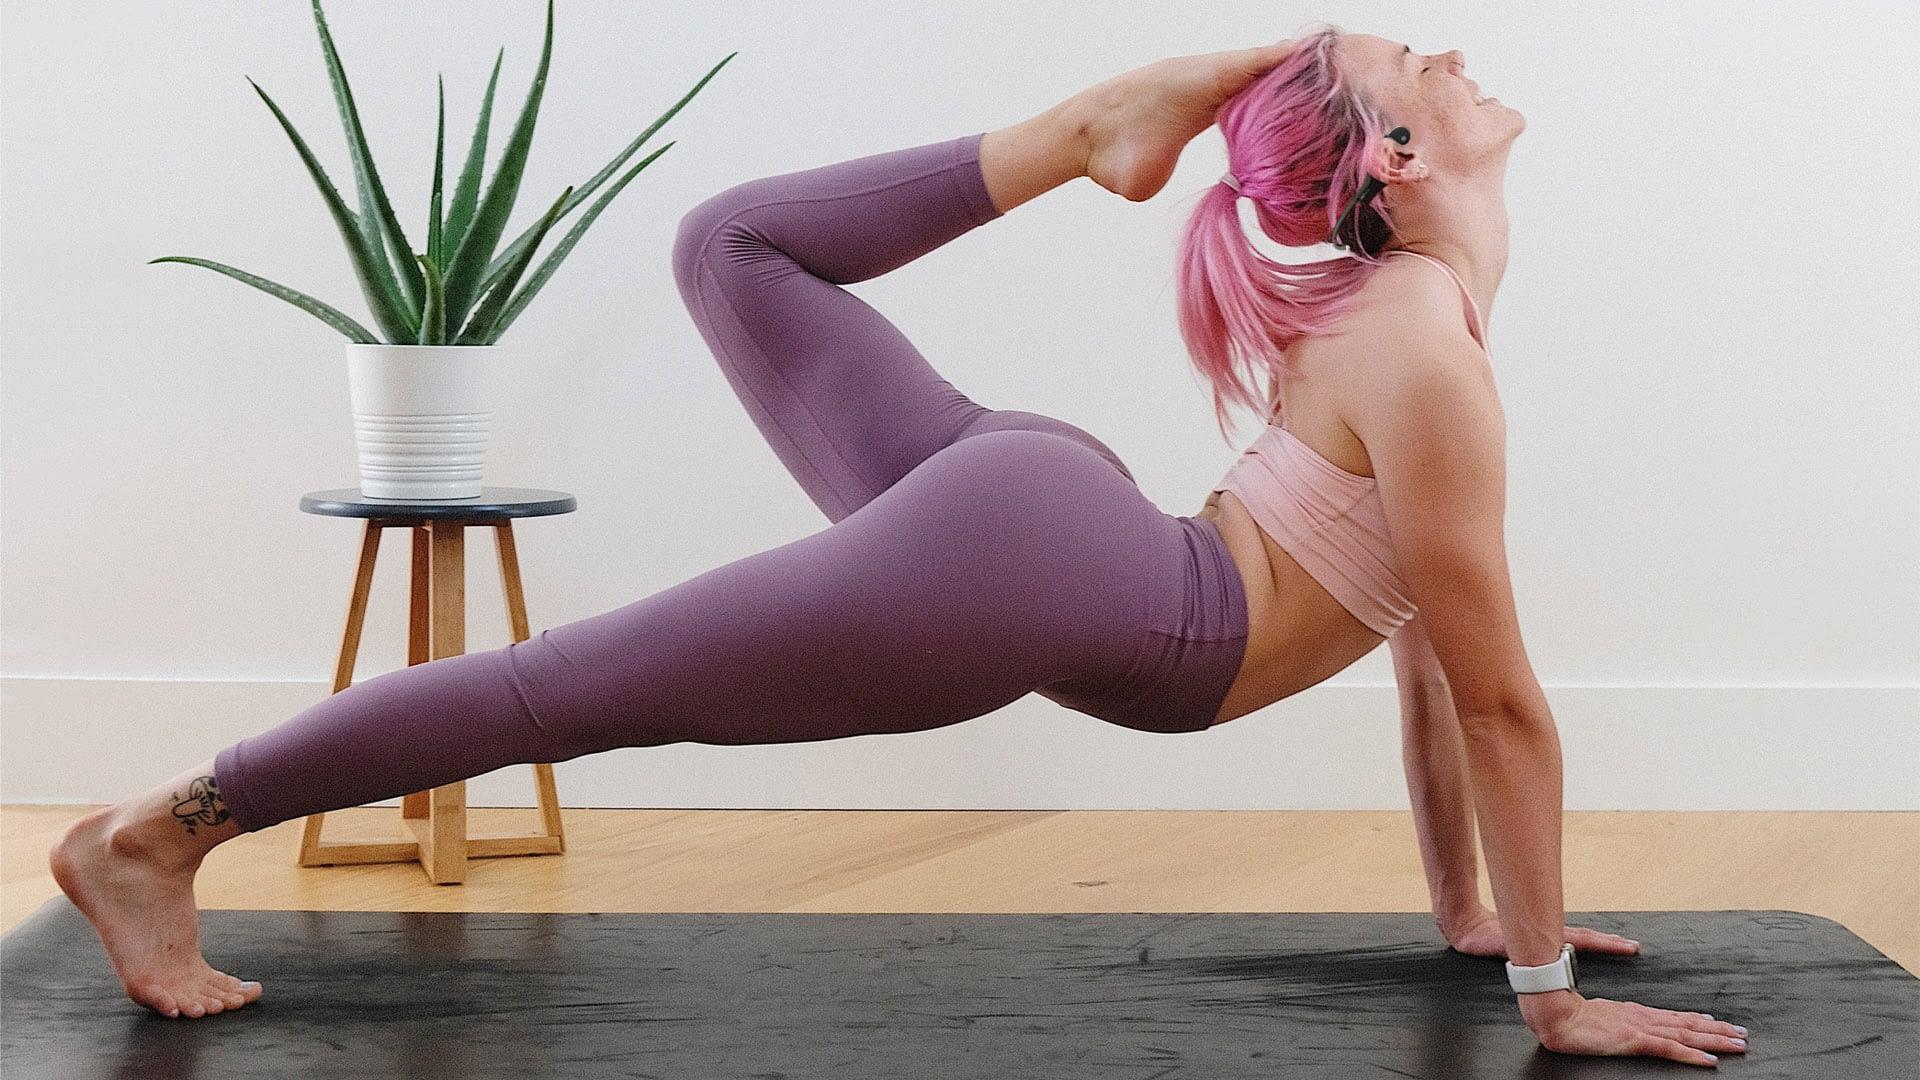 women using bone conduction headphones australia for yoga and comfort listening sports headphones